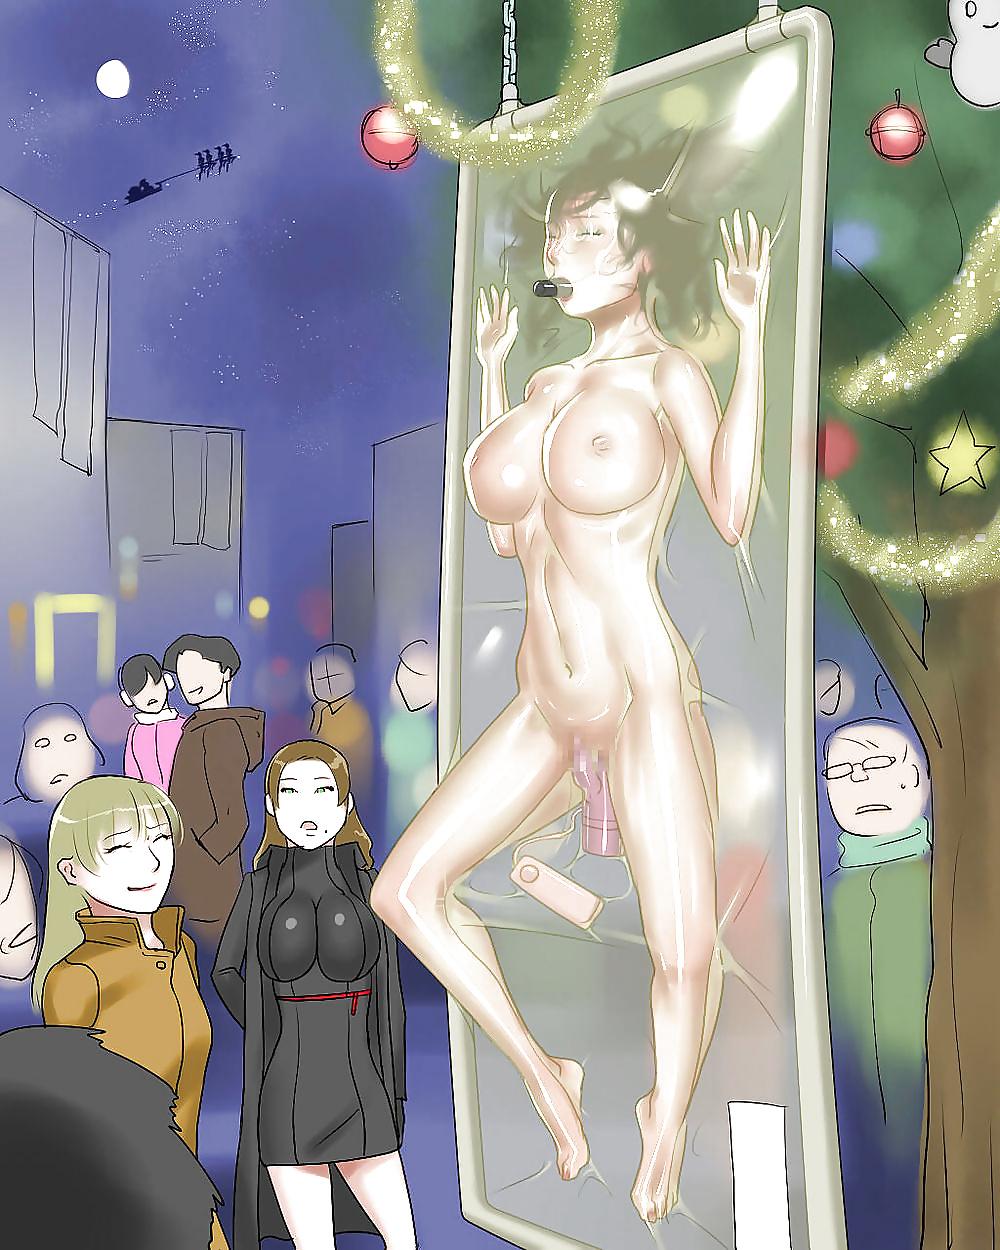 Bdsm hentai gallery